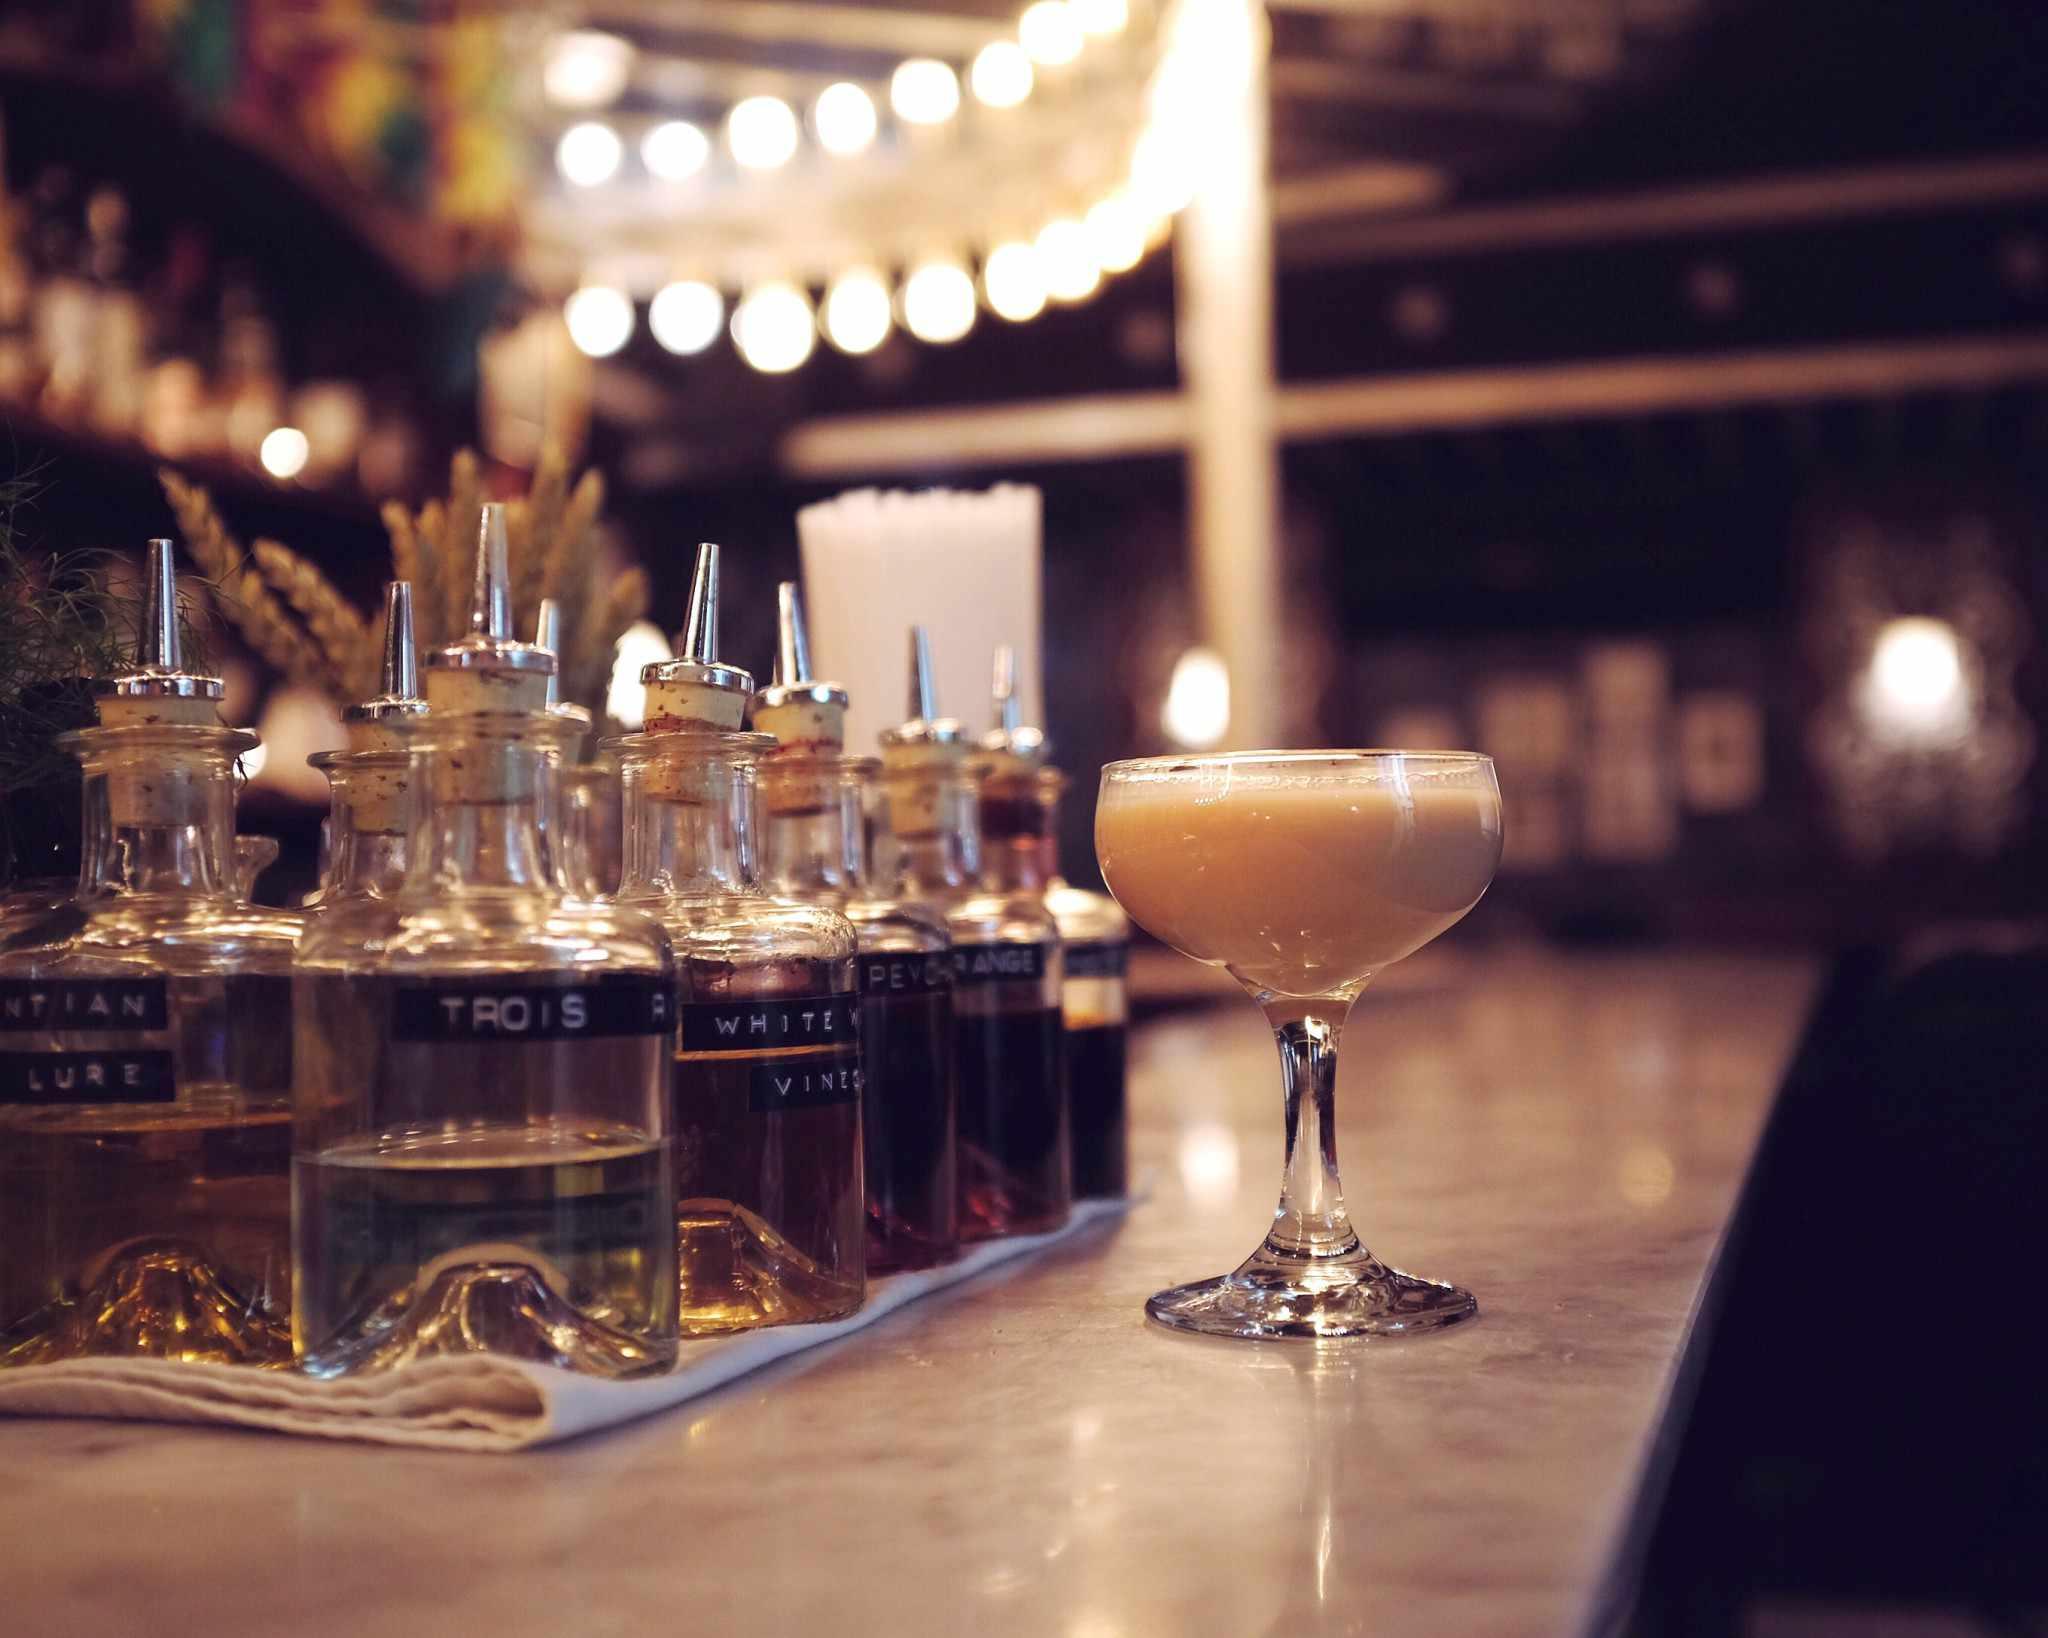 Cocktails at Lulu White, Paris